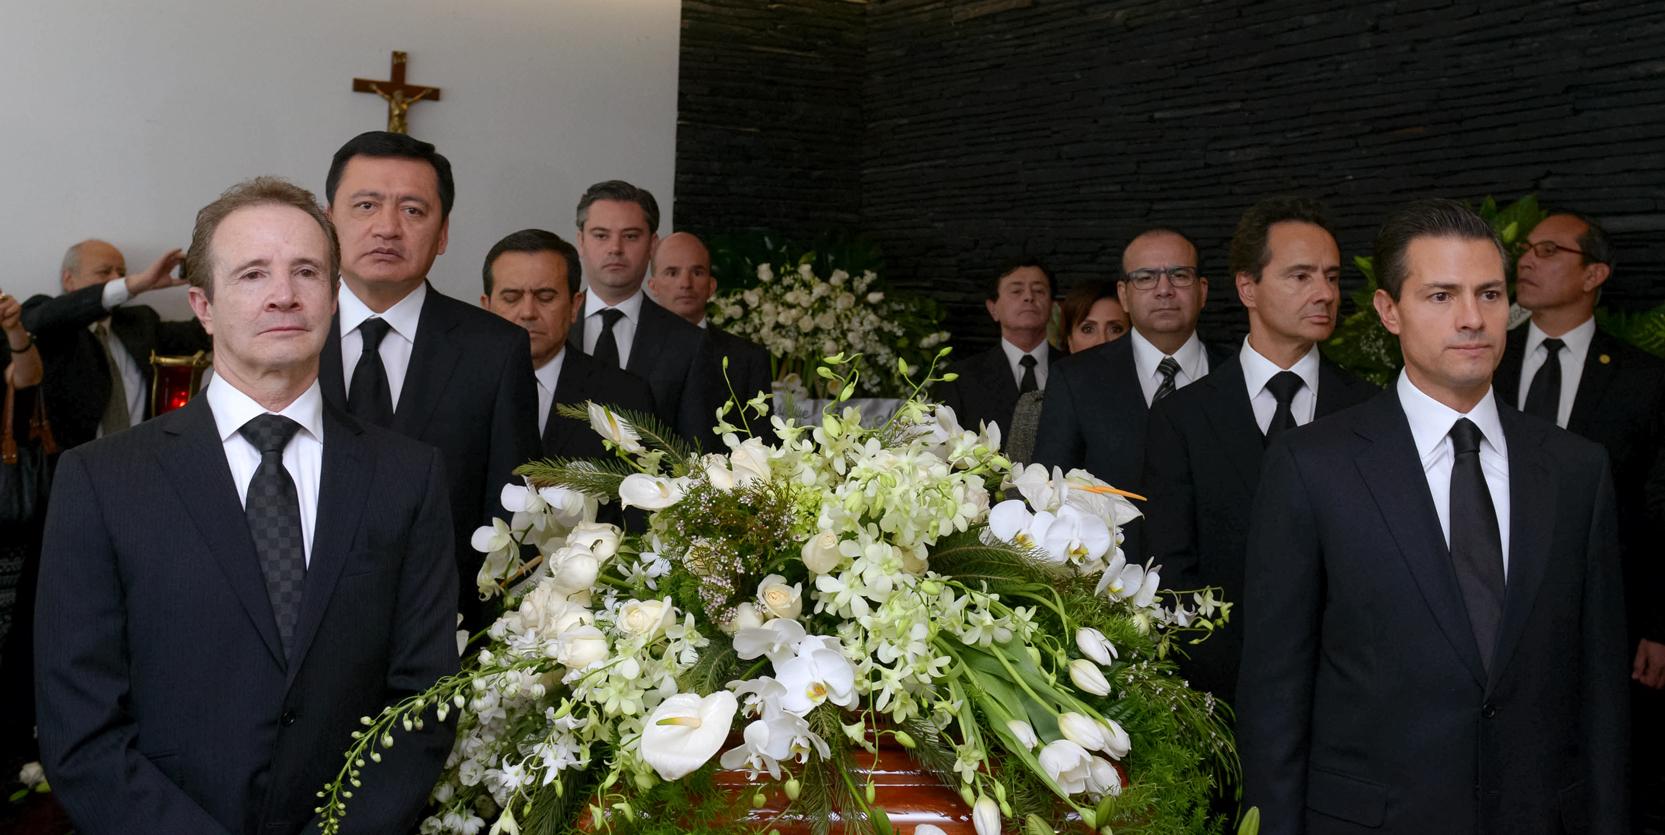 Excequias Joaquin Gamboa Pascoejpg